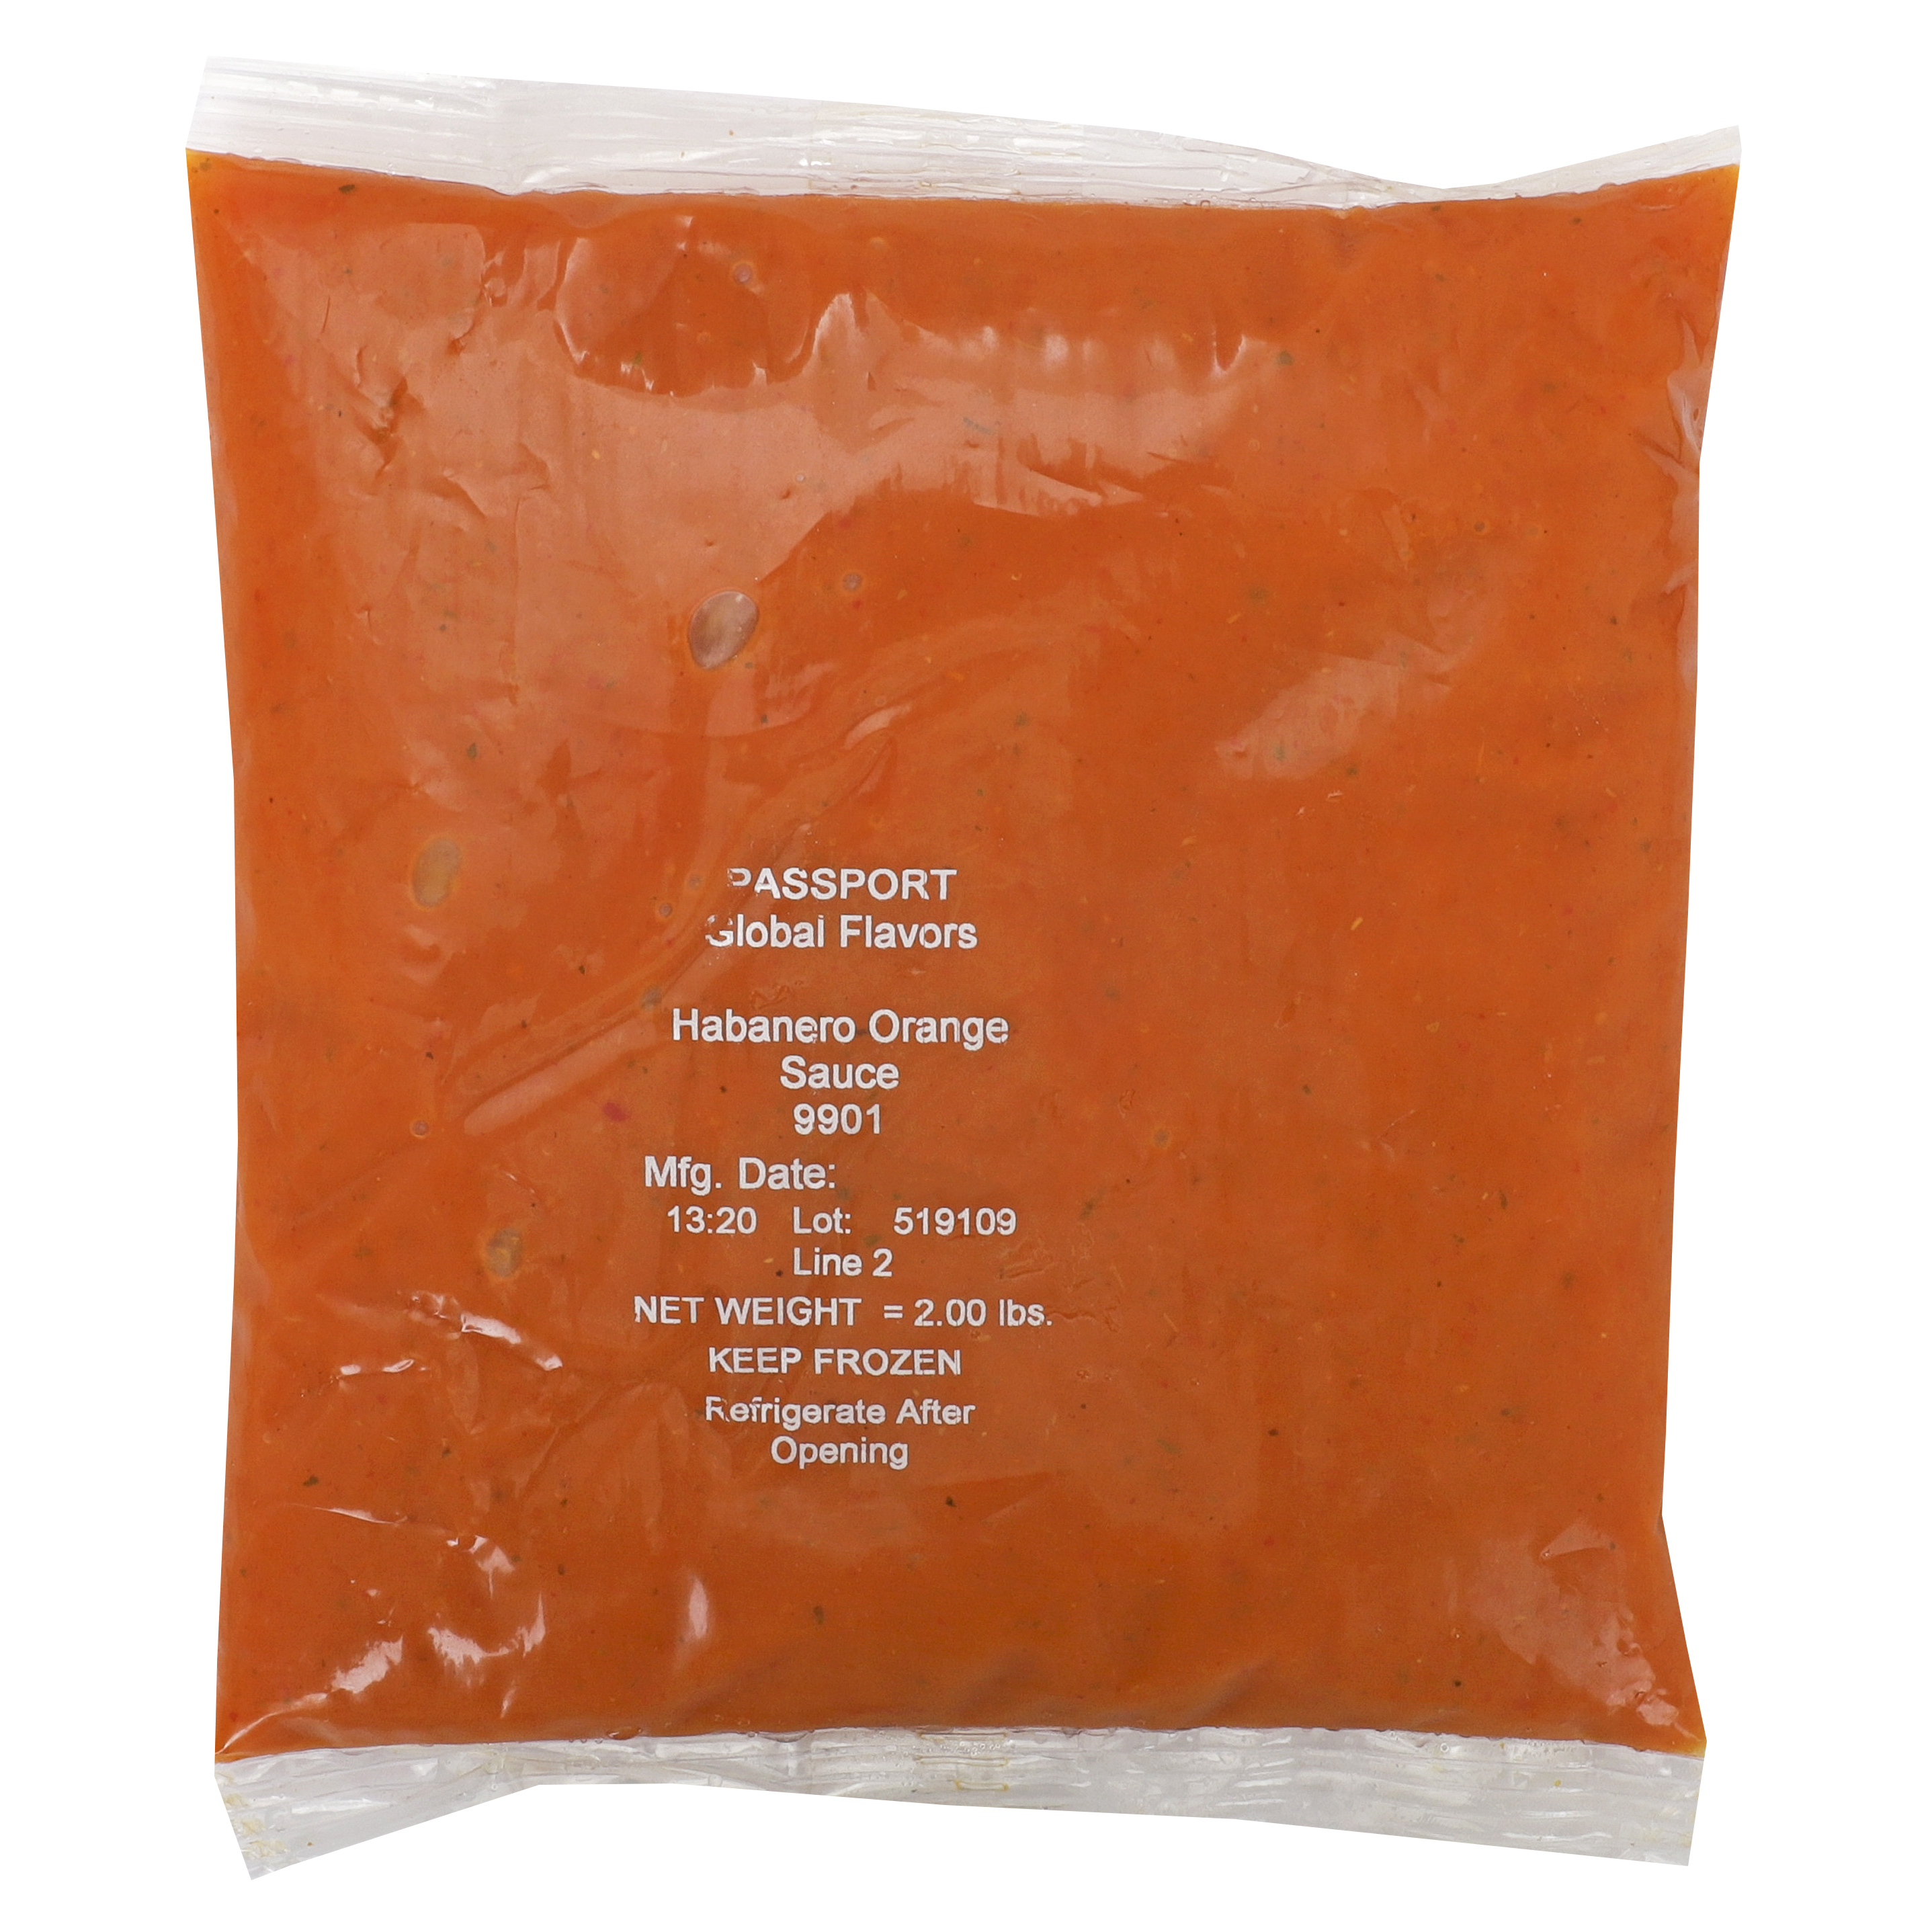 9901 - Passport Global Flavors By Custom Culinary Habanero Orange Sauce